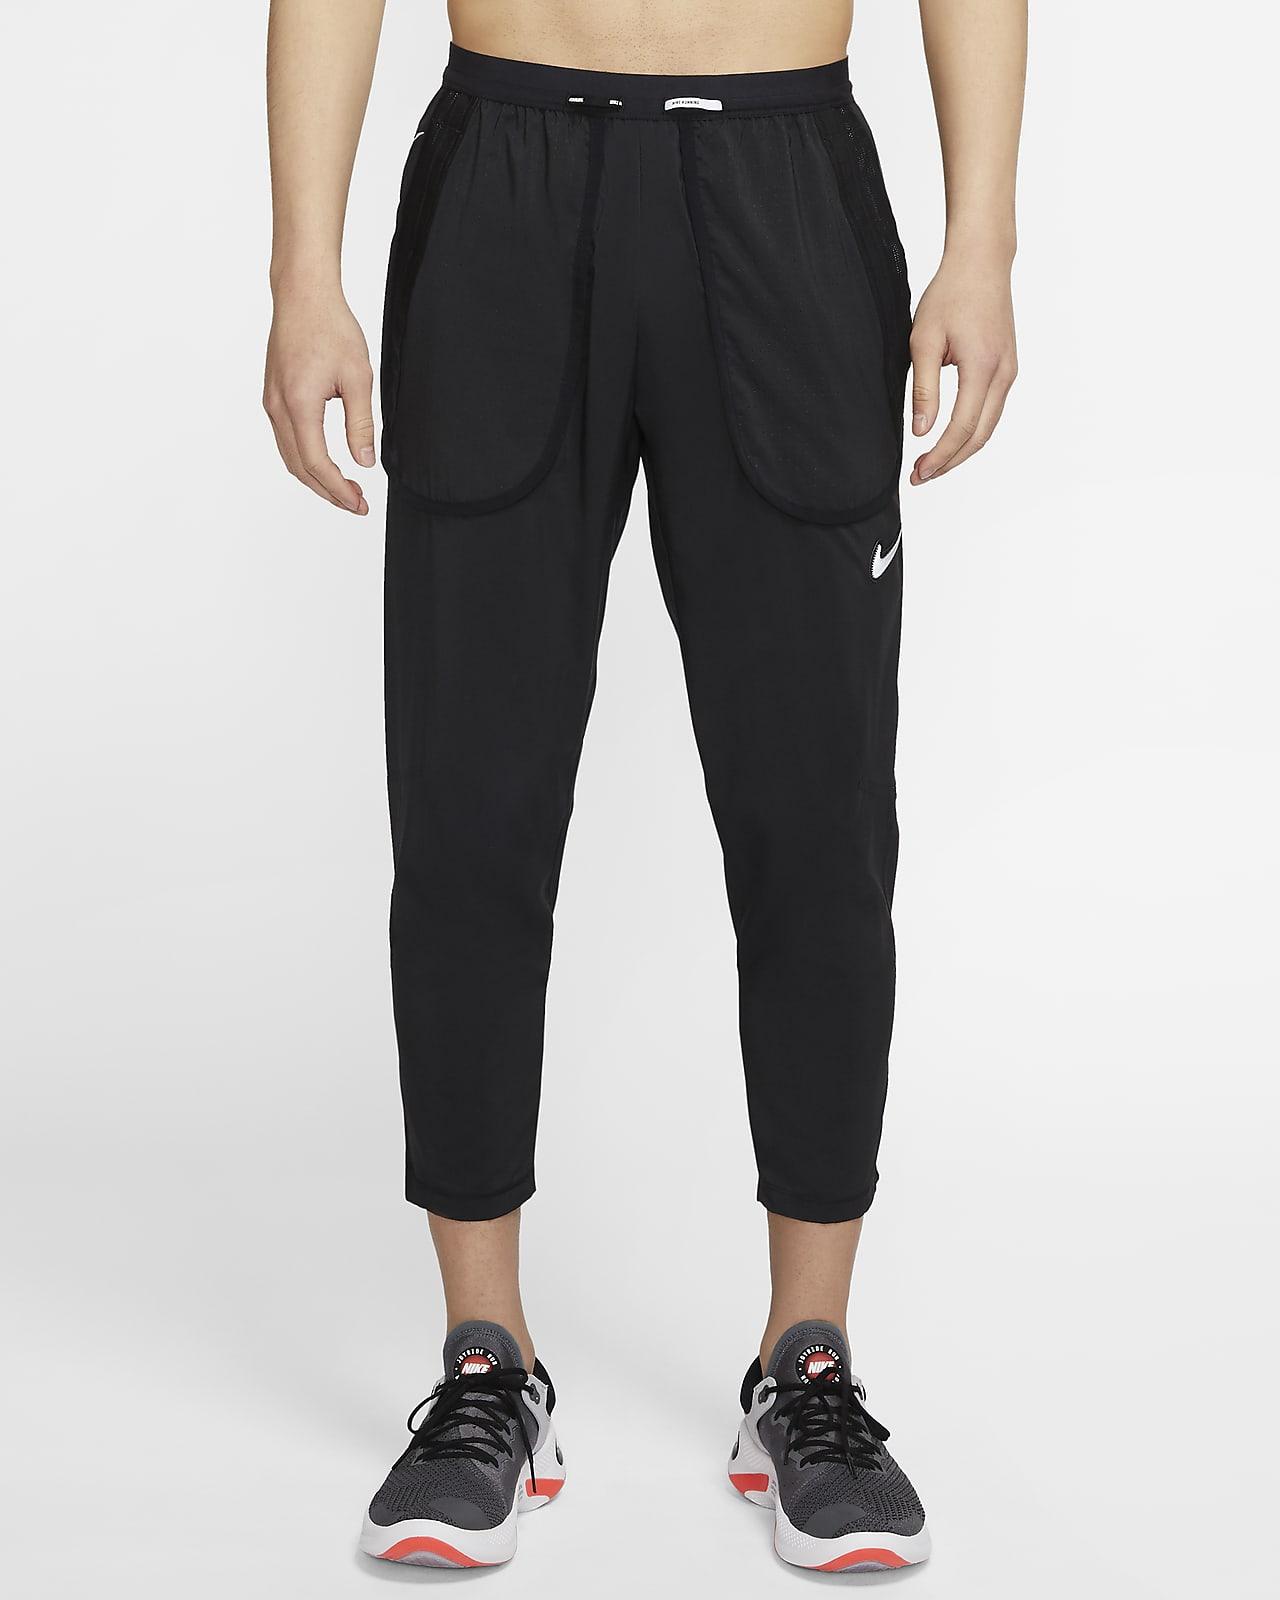 Pantalon de running Nike Phenom Wild Run pour Homme